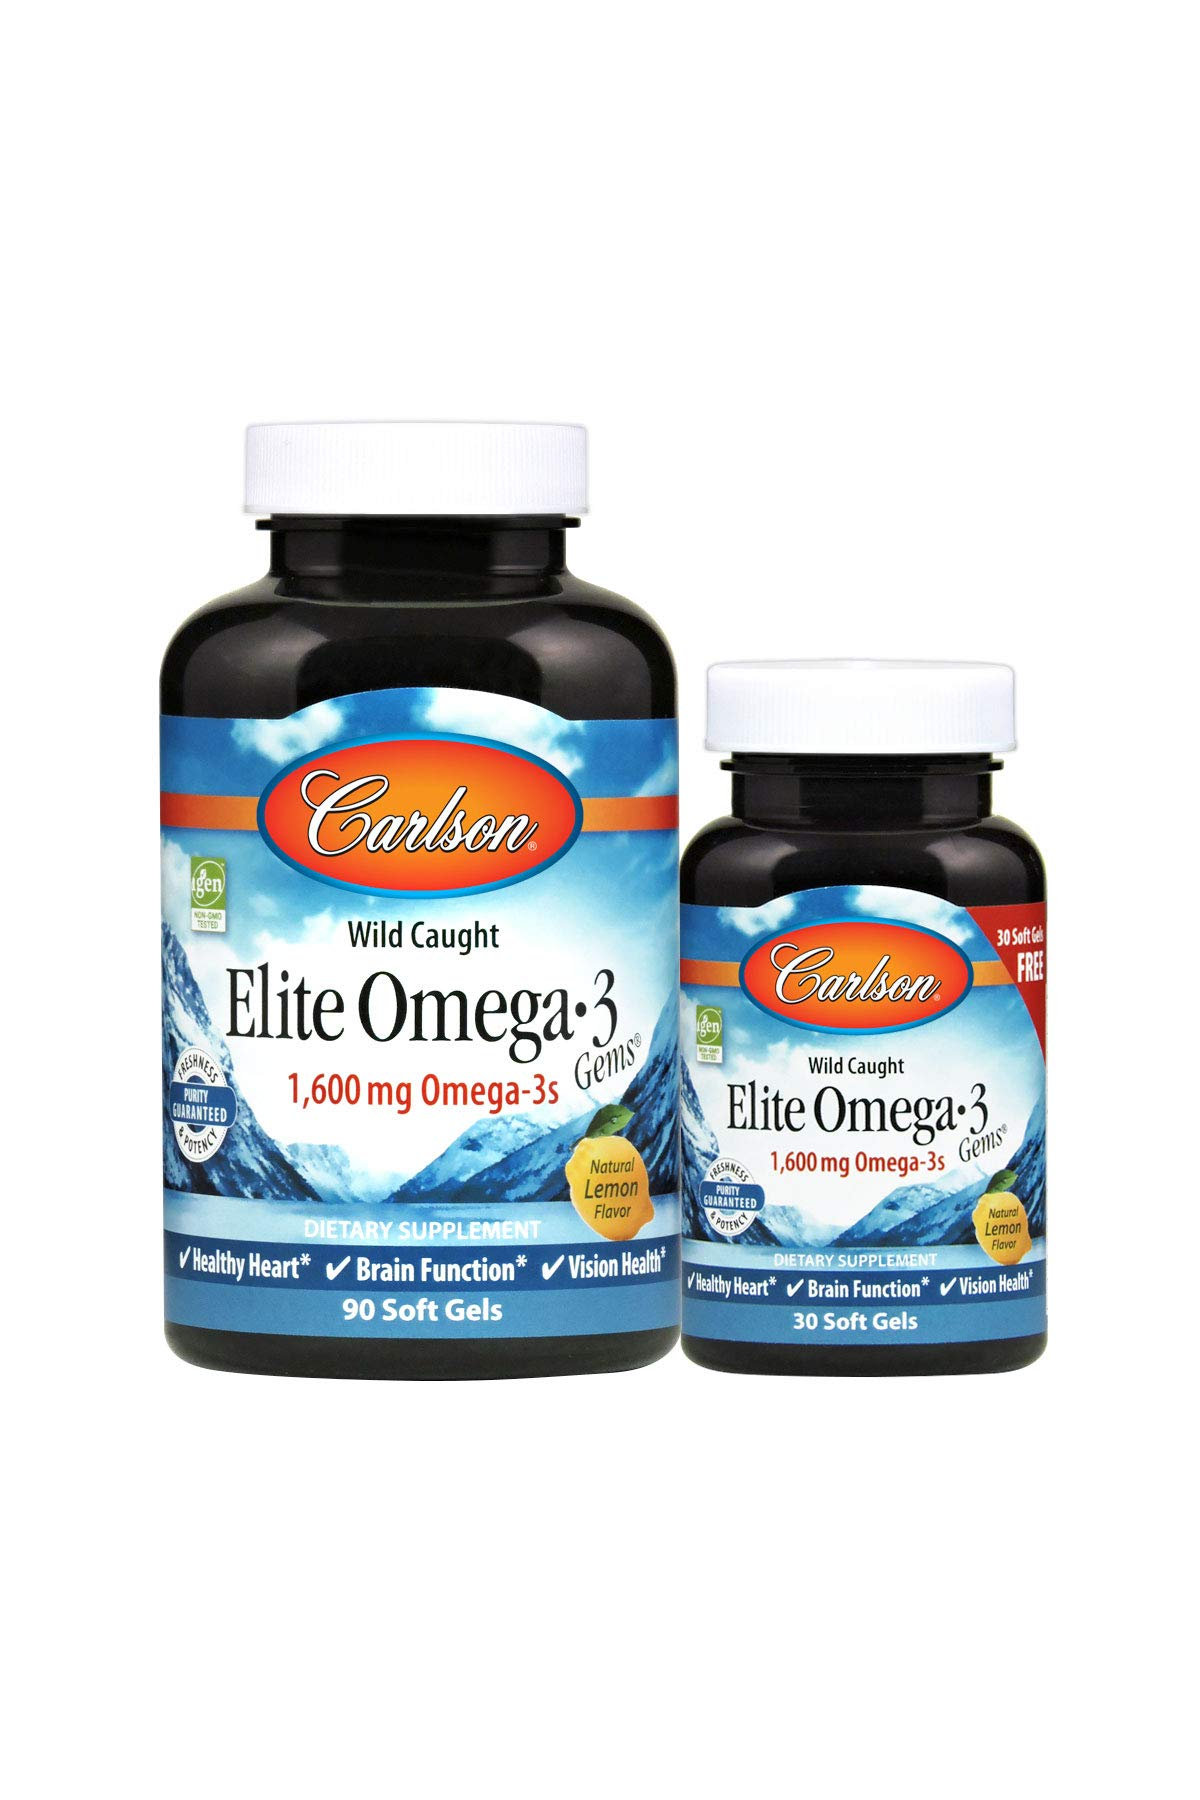 Carlson - Elite Omega-3 Gems, 1600 mg Omega-3s, Wild Caught, Sustainably Sourced, Lemon, 90+30 Soft gels